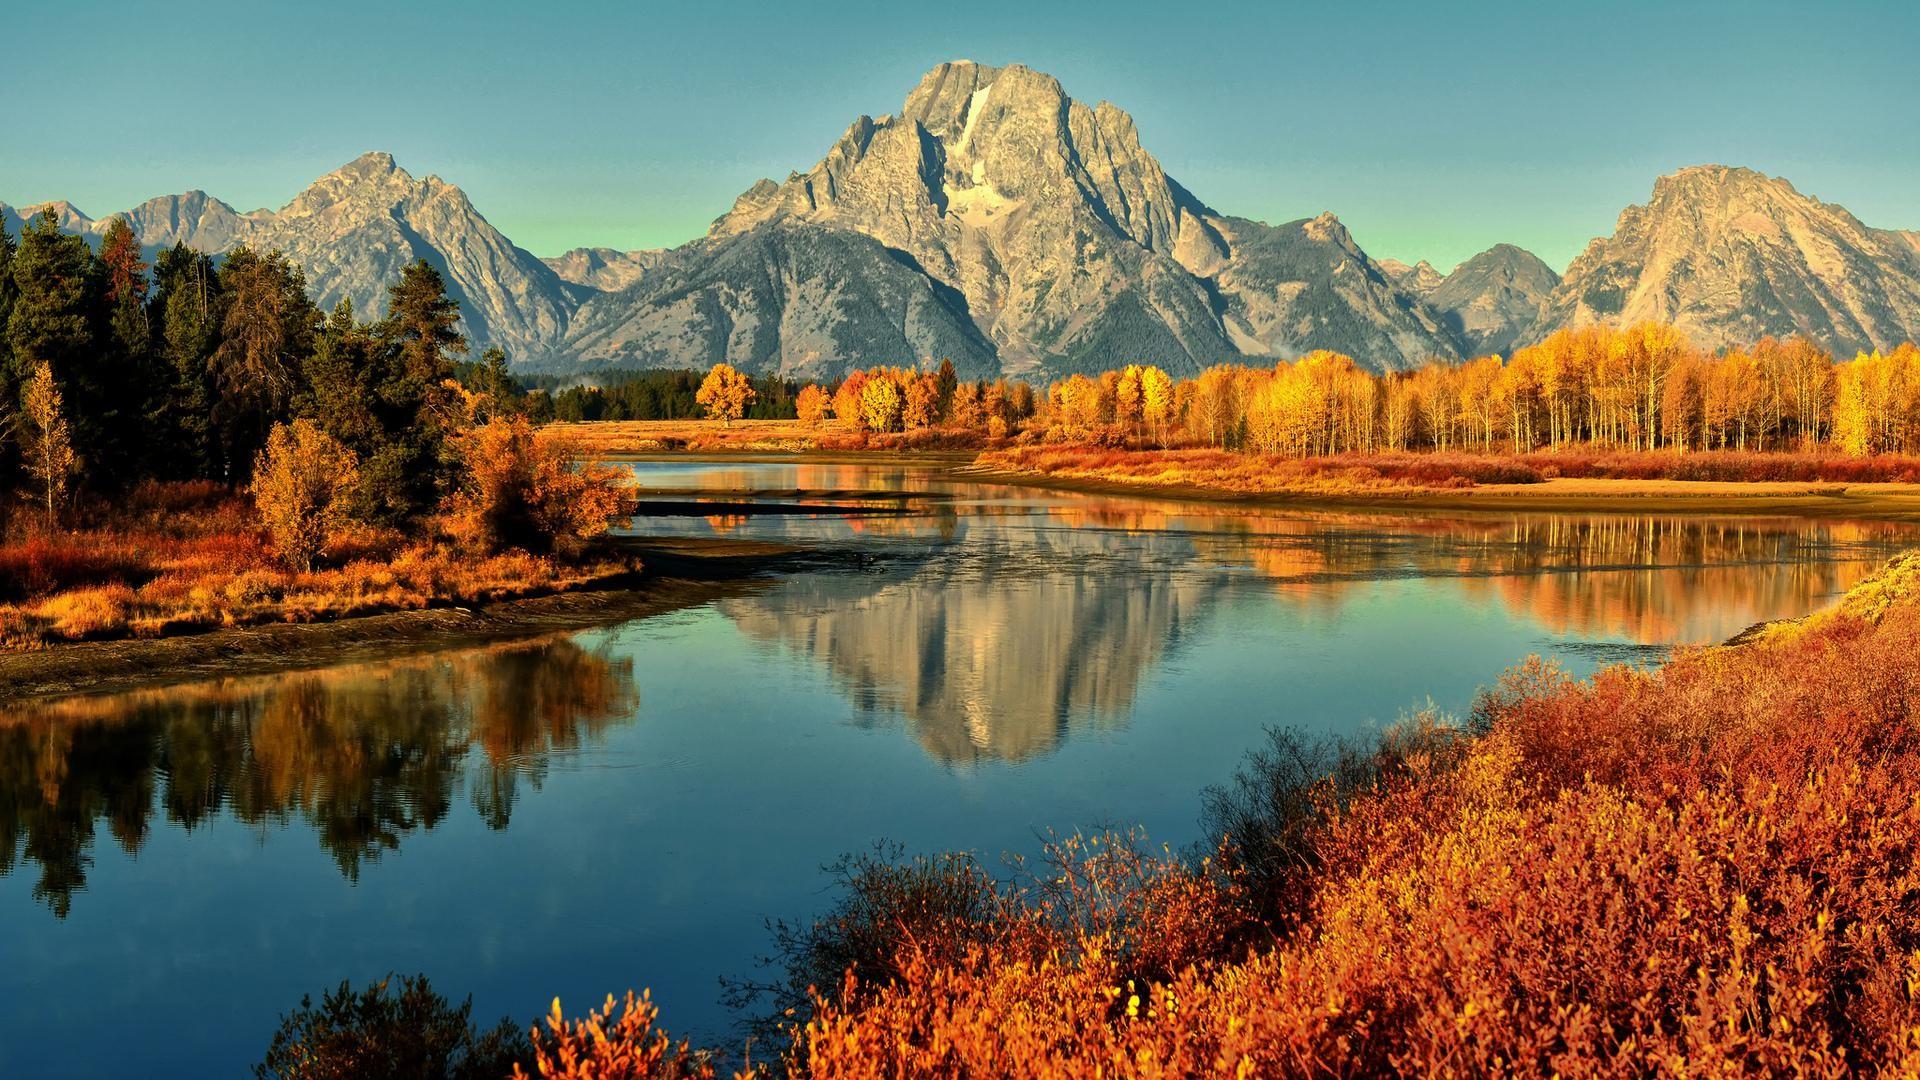 Fall-Scenery-HD-Photos